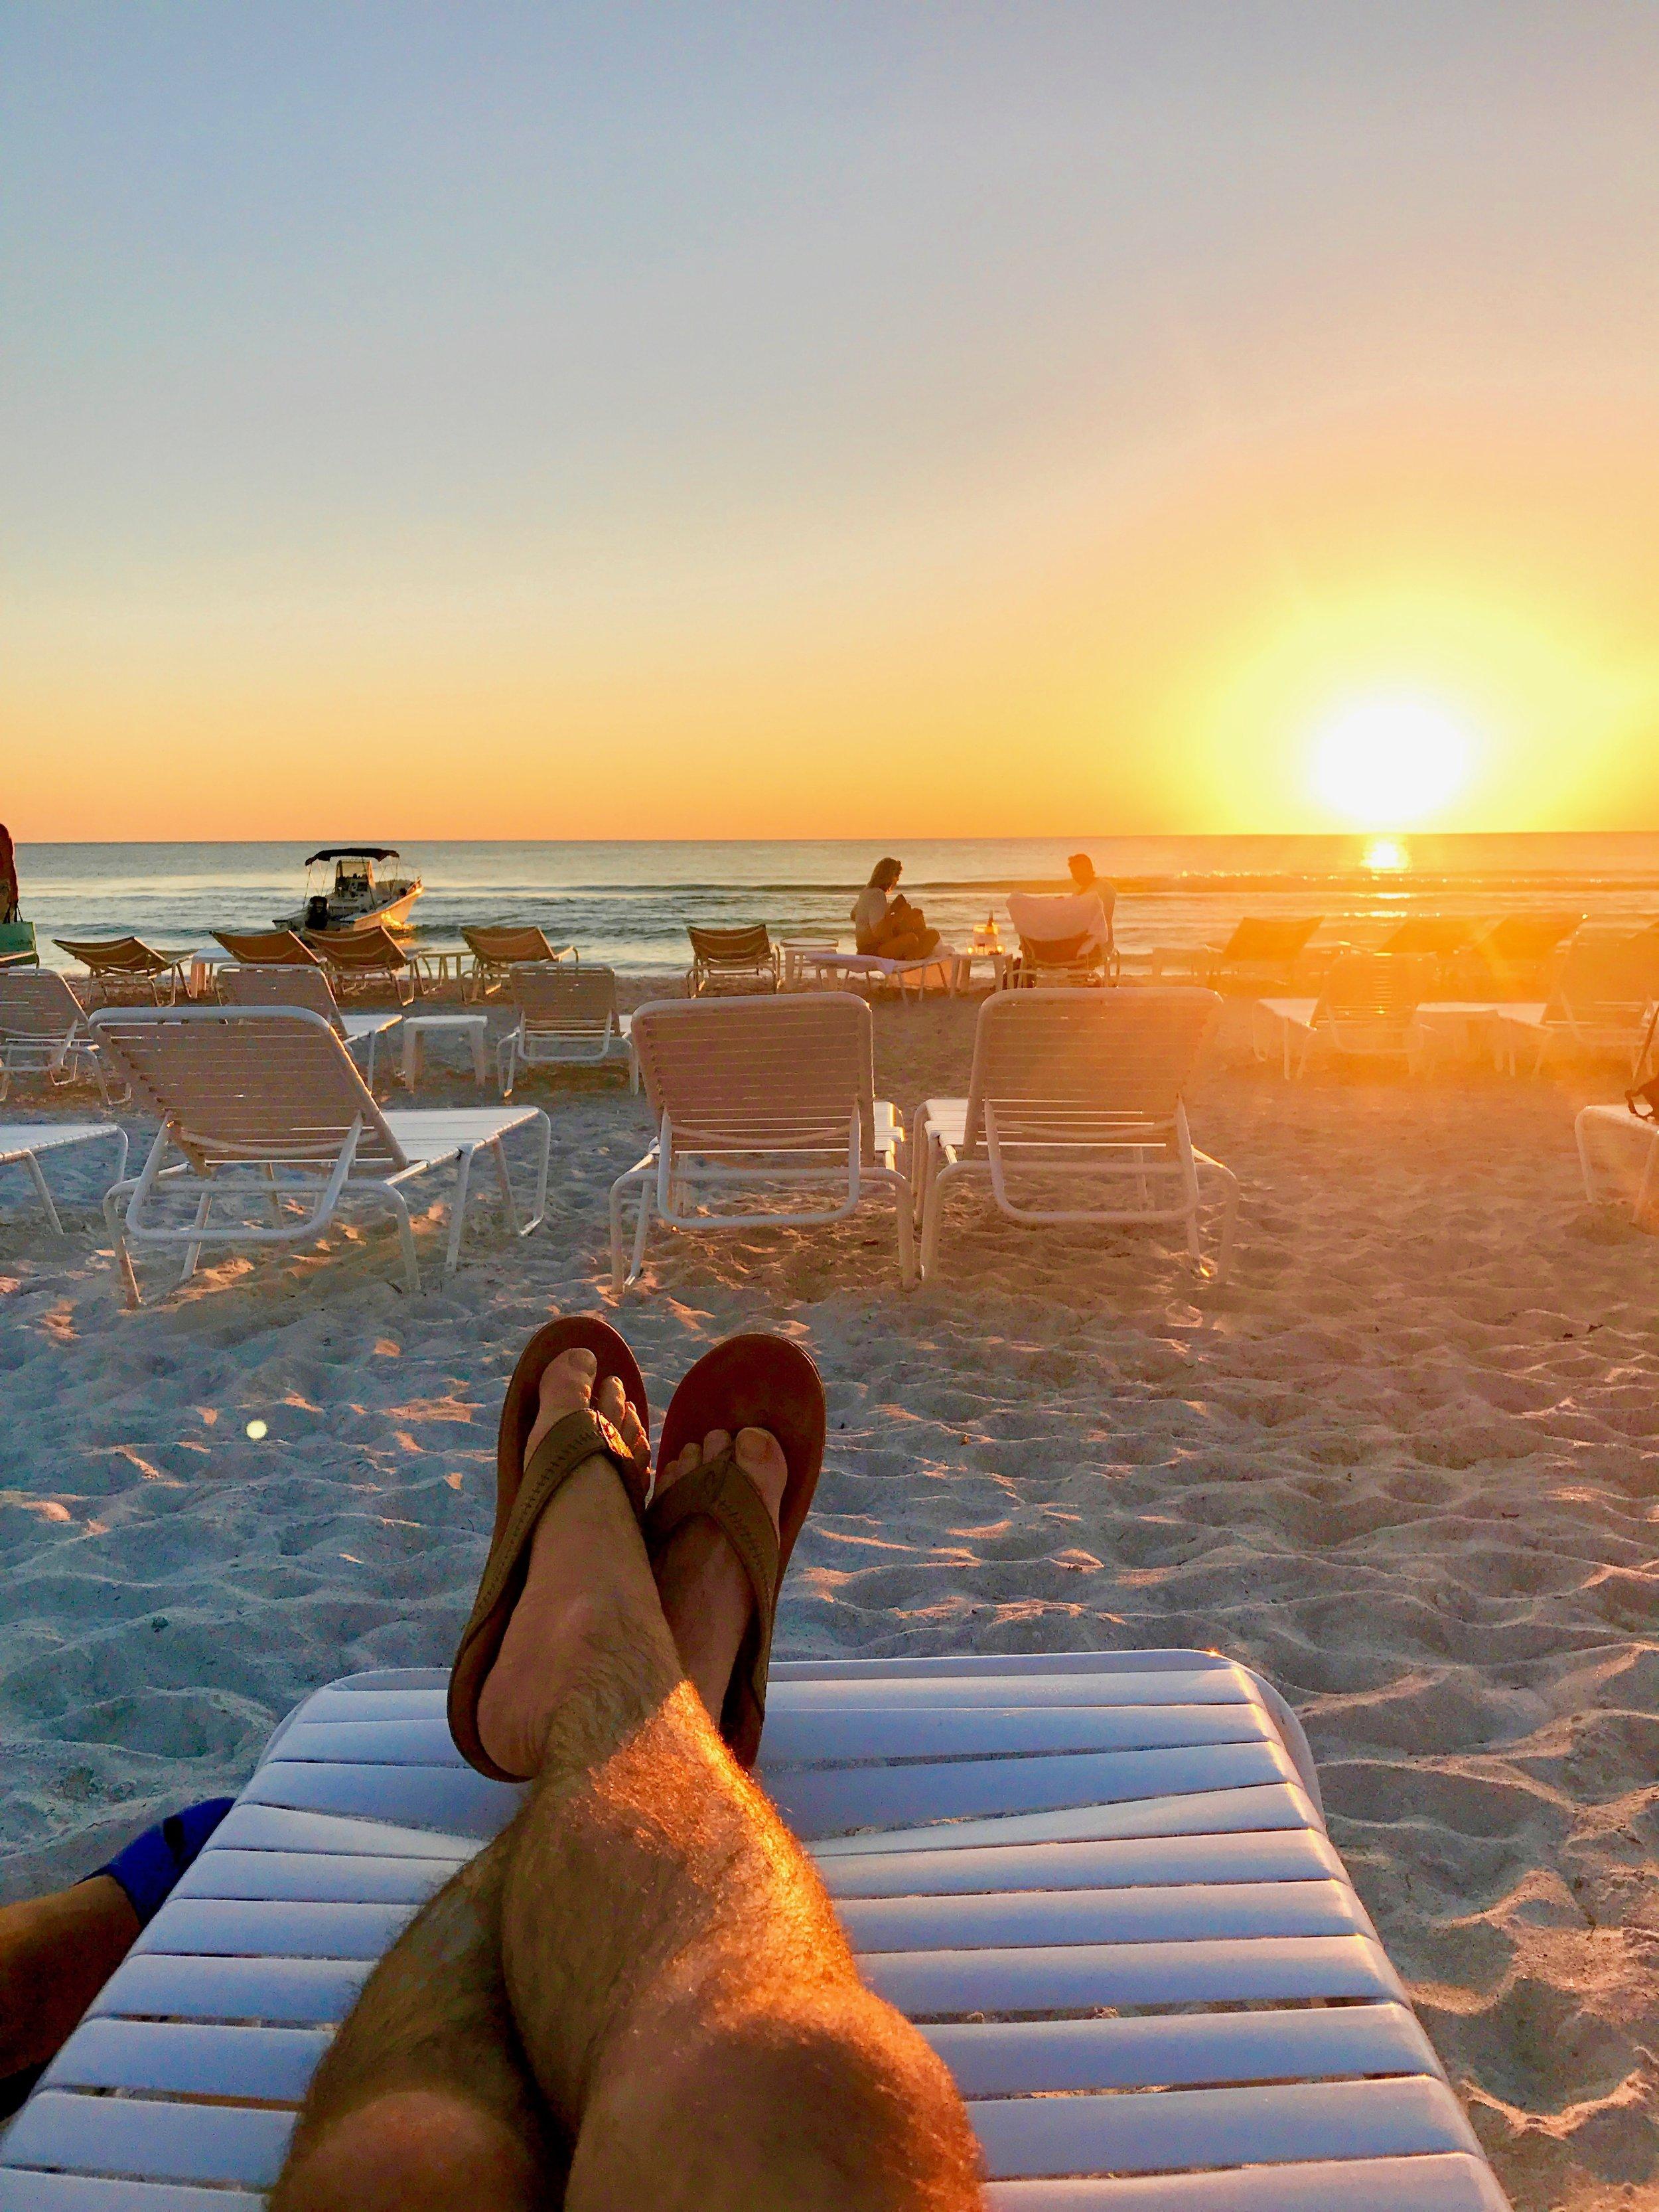 The Speakeasy of beachside tiki bars